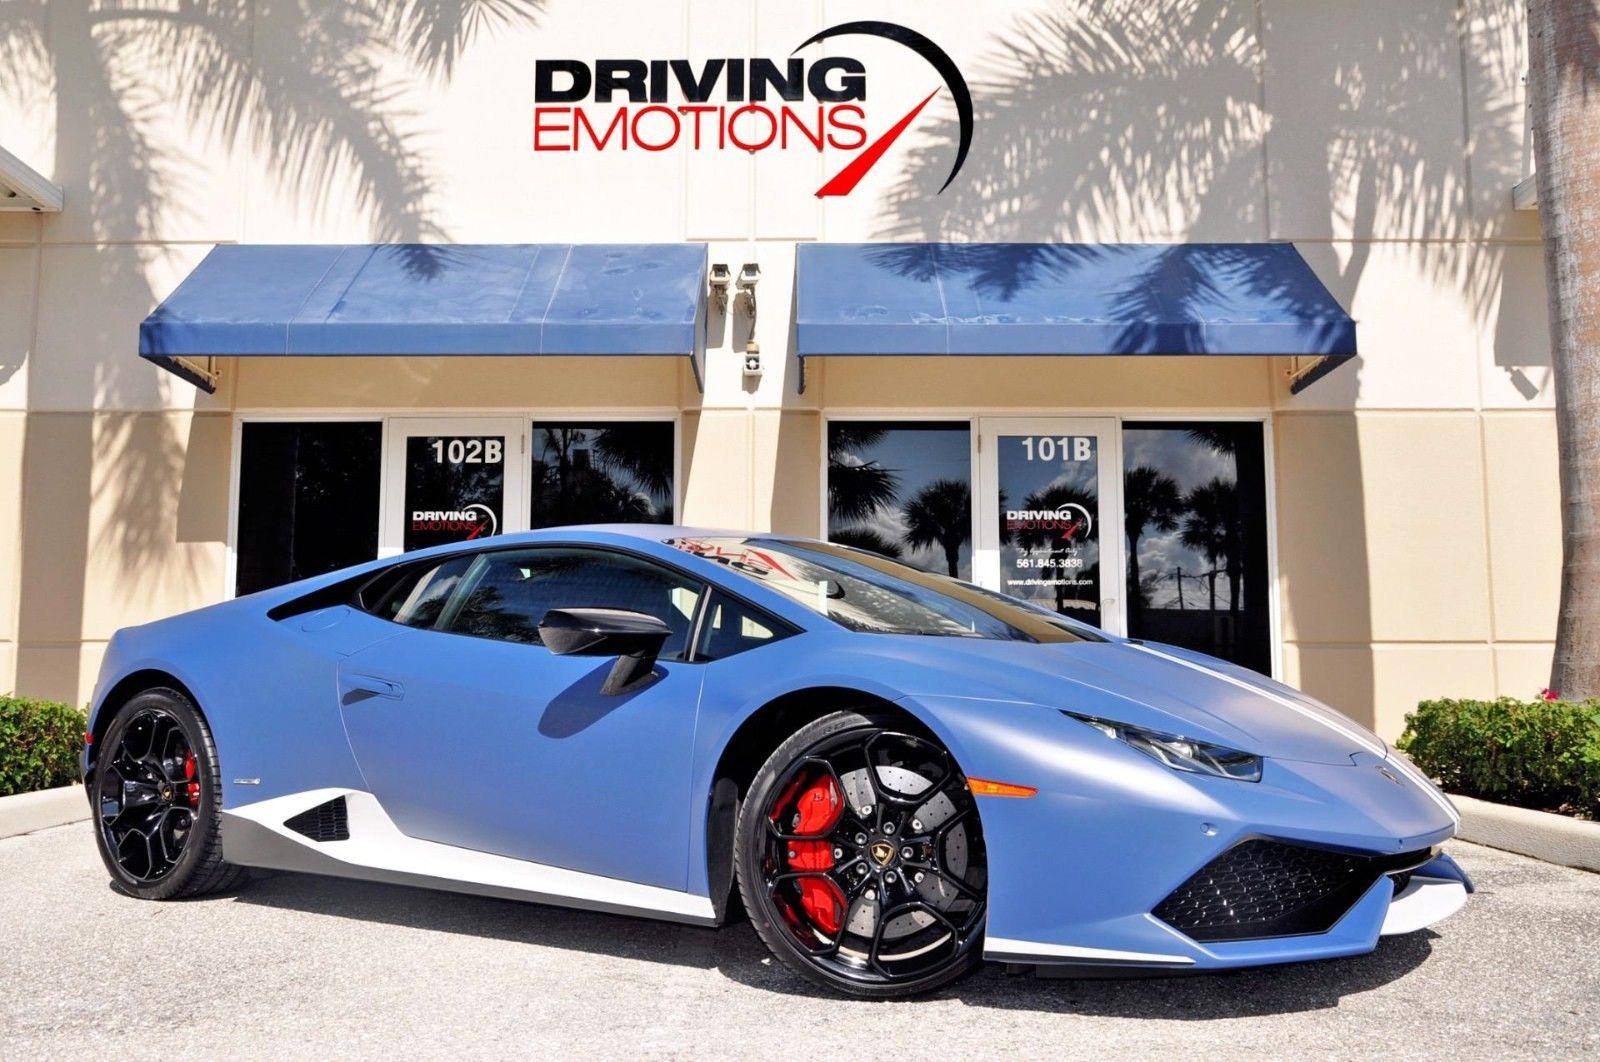 Amazing 2017 Lamborghini Huracan Lp610 4 Coupe Se Avio 283k Msrp Blue Grifo 1 0f 250 Ccb Collector 2018